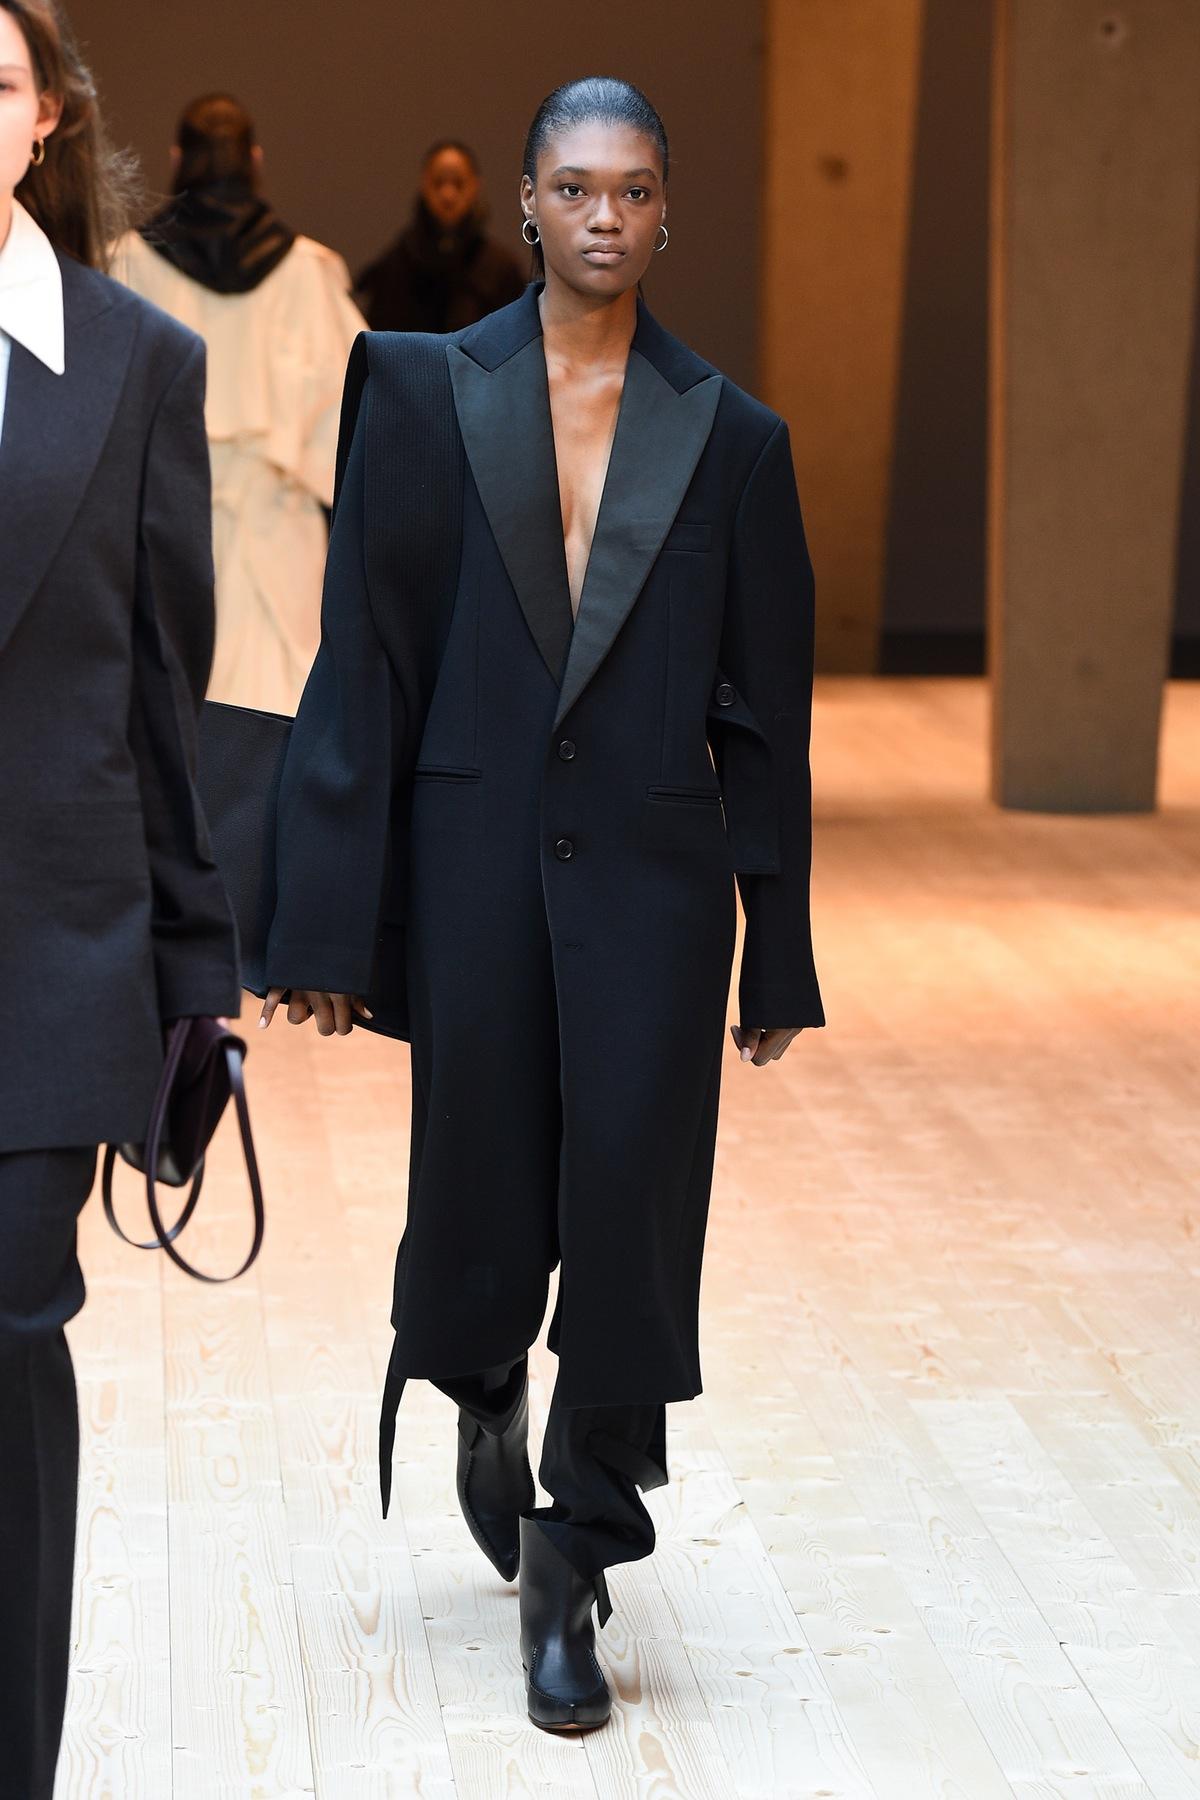 Céline Autumn 2017, image via The Business Of Fashion